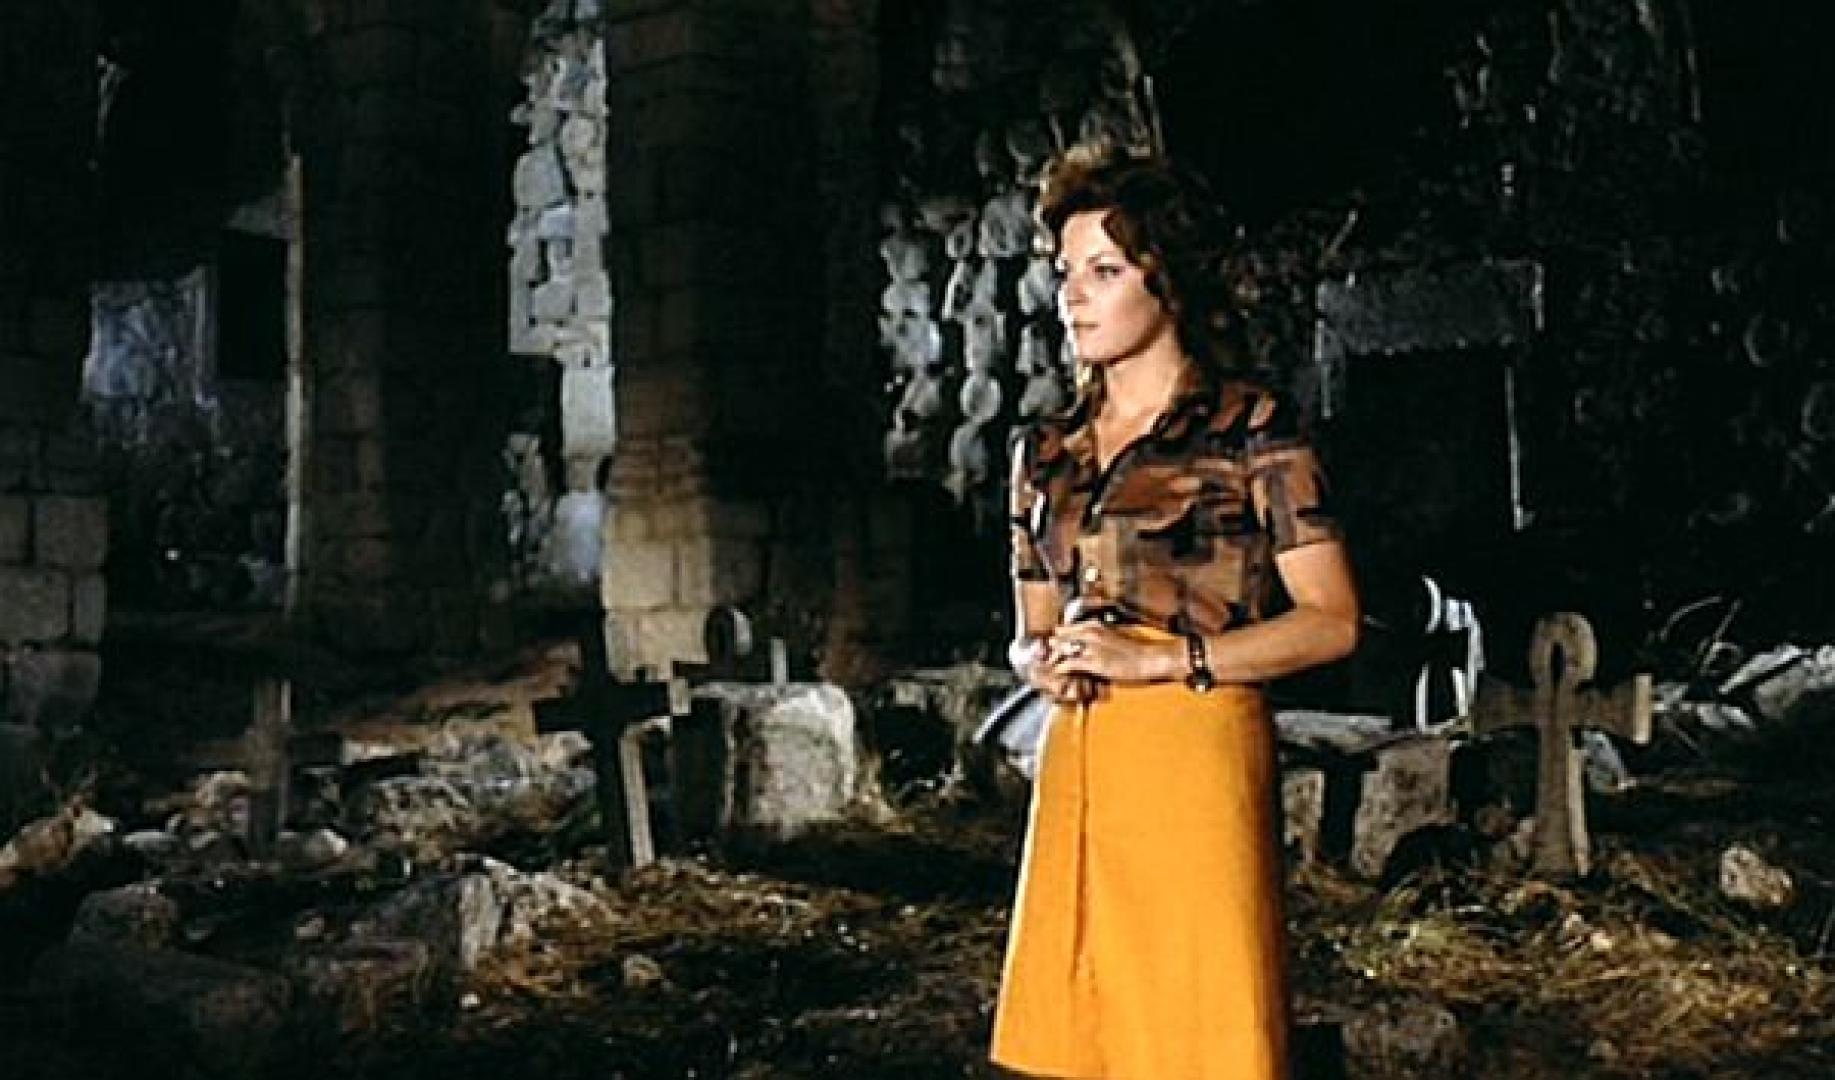 La noche del terror ciego - Vakrémület (1972)